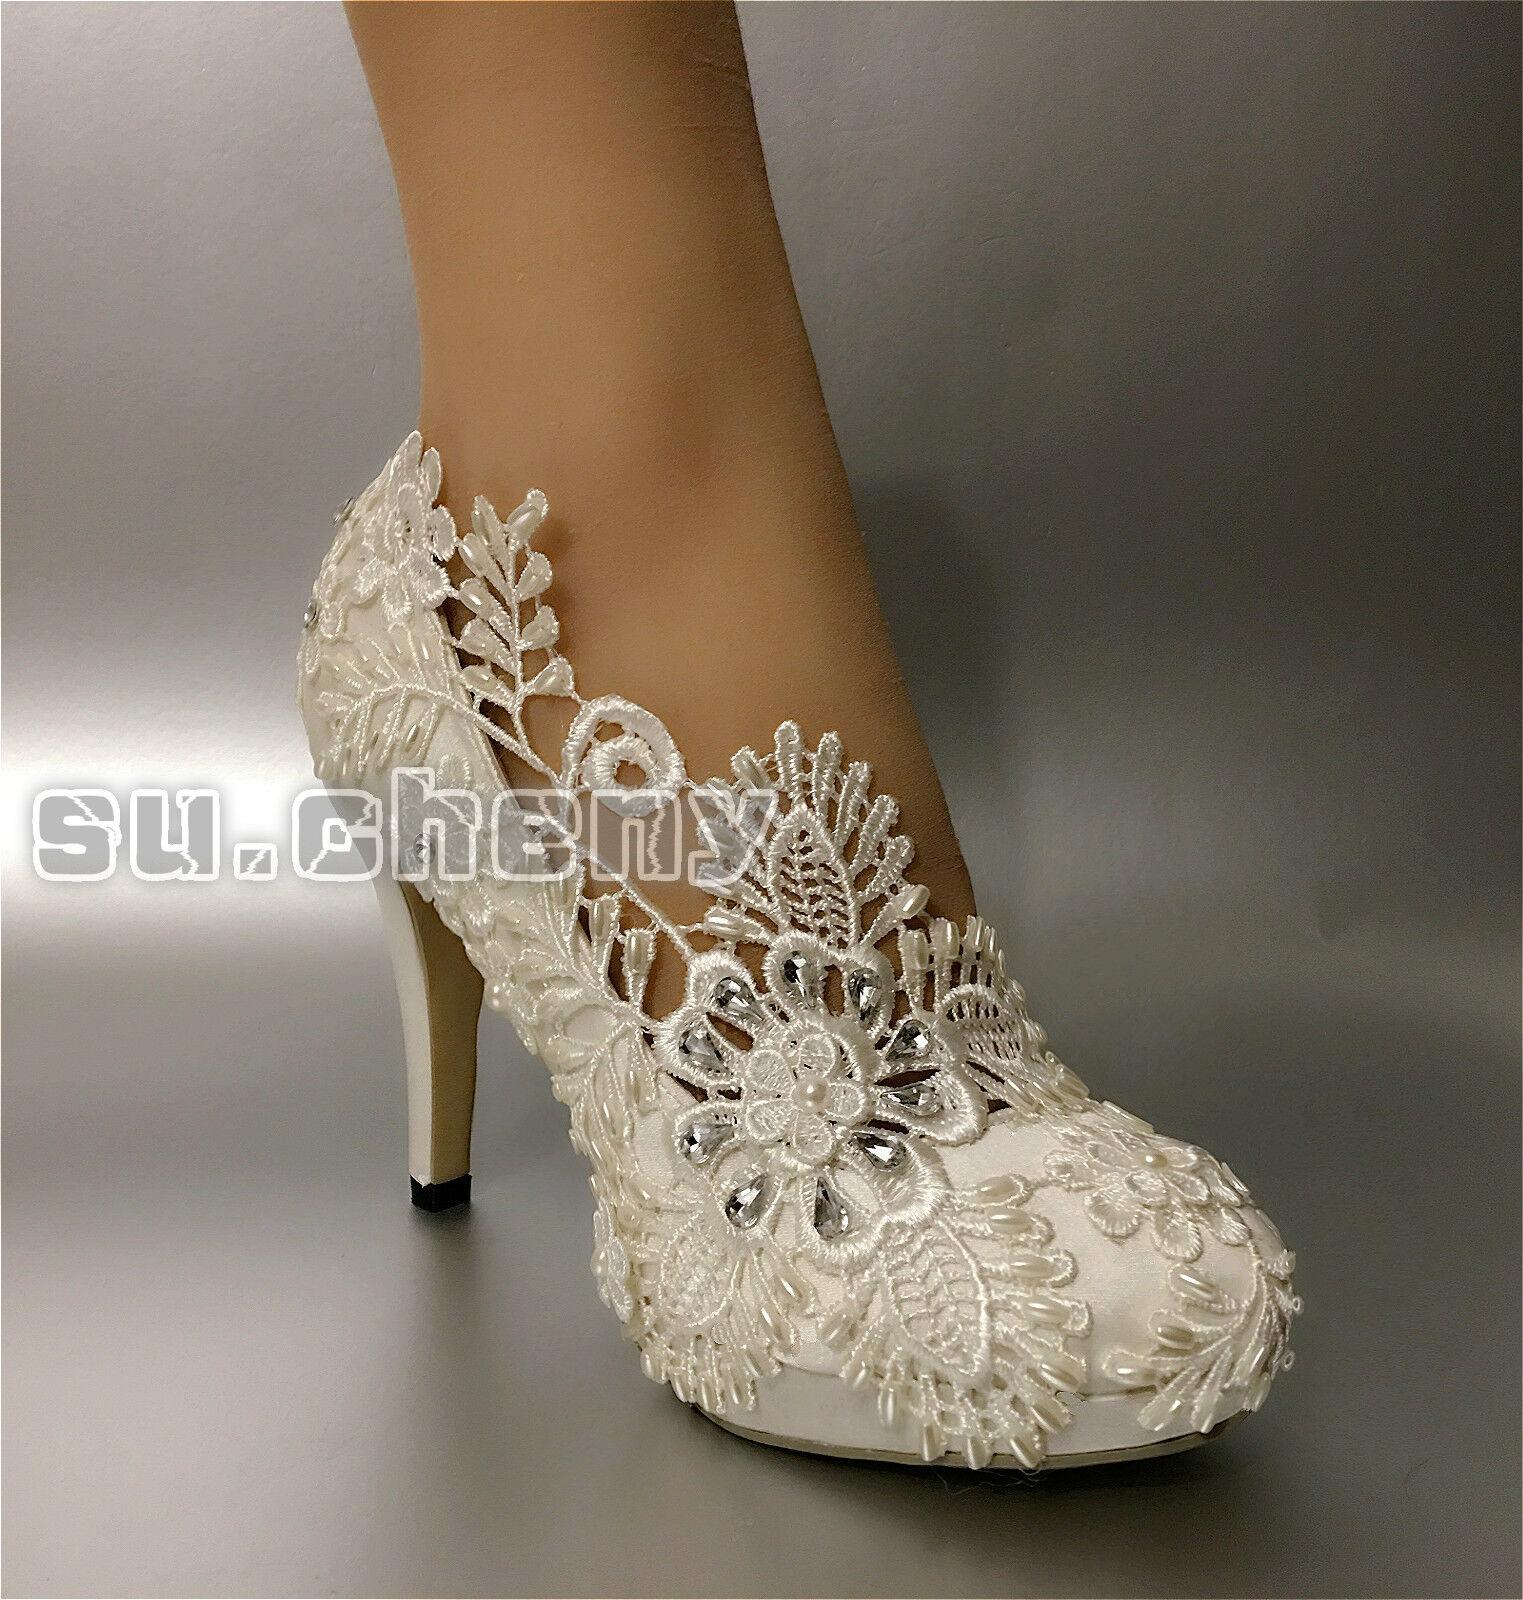 Su.cheny Su.cheny Su.cheny 3  4  heels White light ivory leaf lace satin pump Wedding Bridal shoes 7f1732